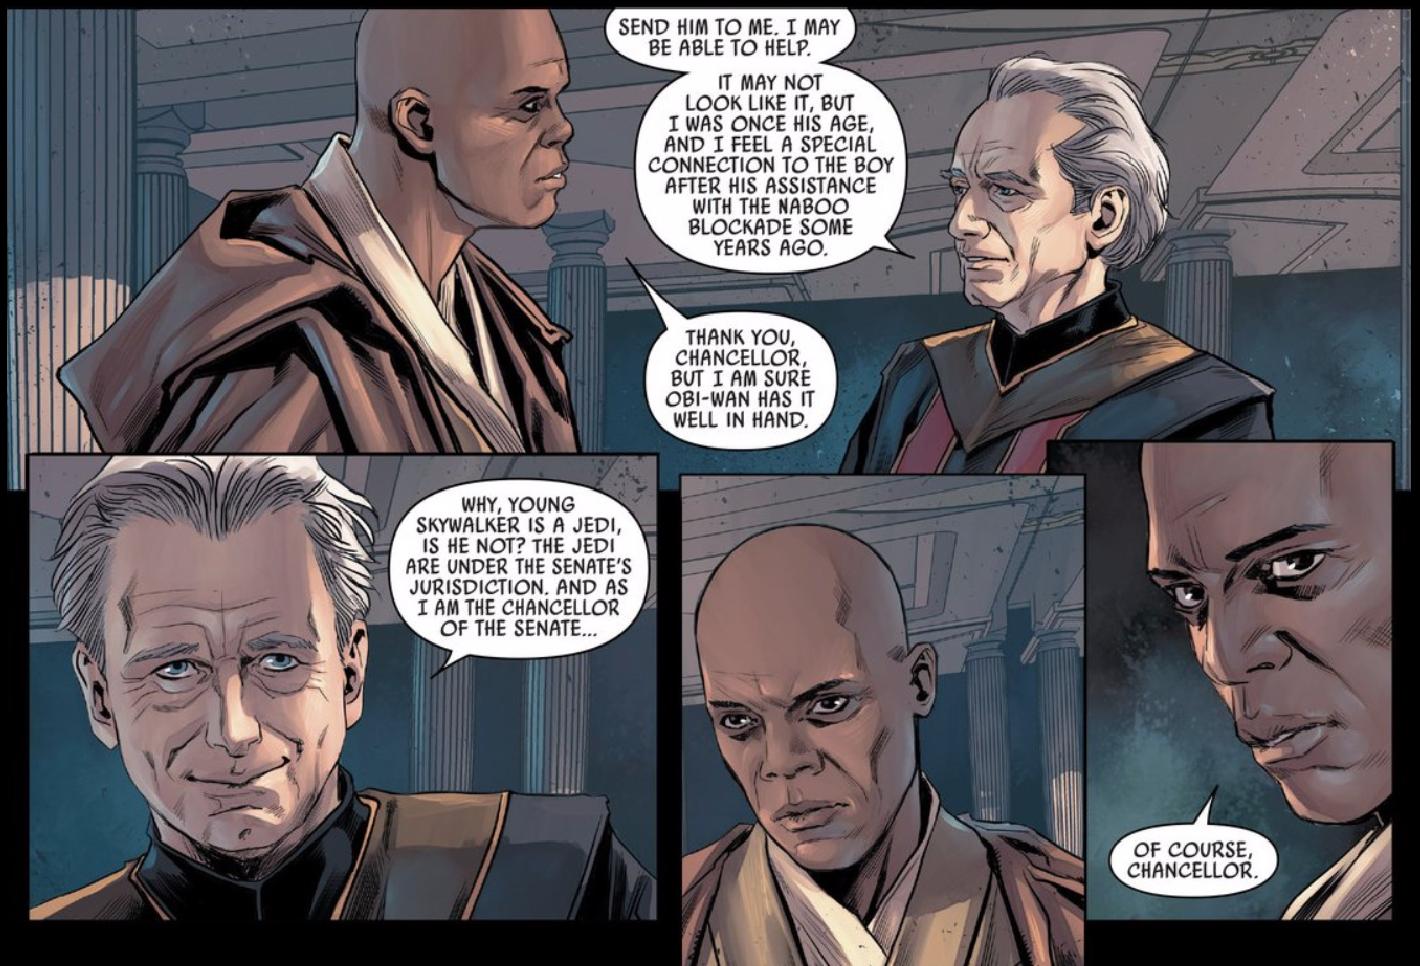 Marvel's Obi-Wan & Anakin Star Wars Comic Is Pretty Pointless